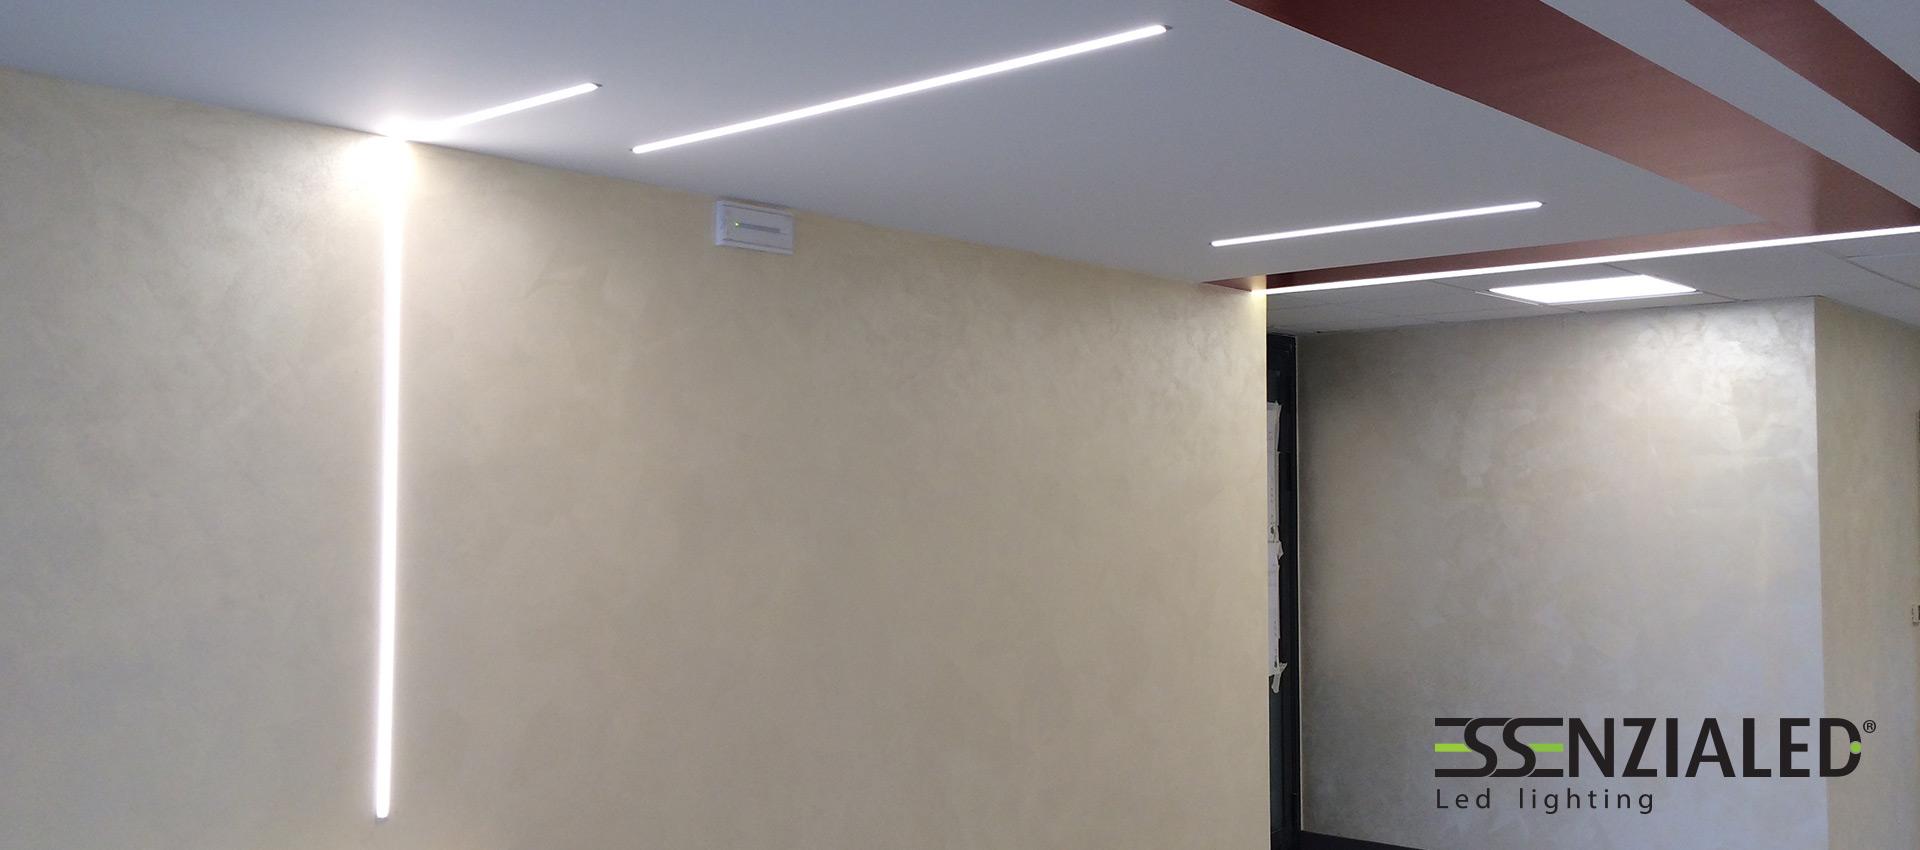 In lampade da incasso per mobili essenzialedessenzialed illuminazione a led - Illuminazione a led per mobili ...